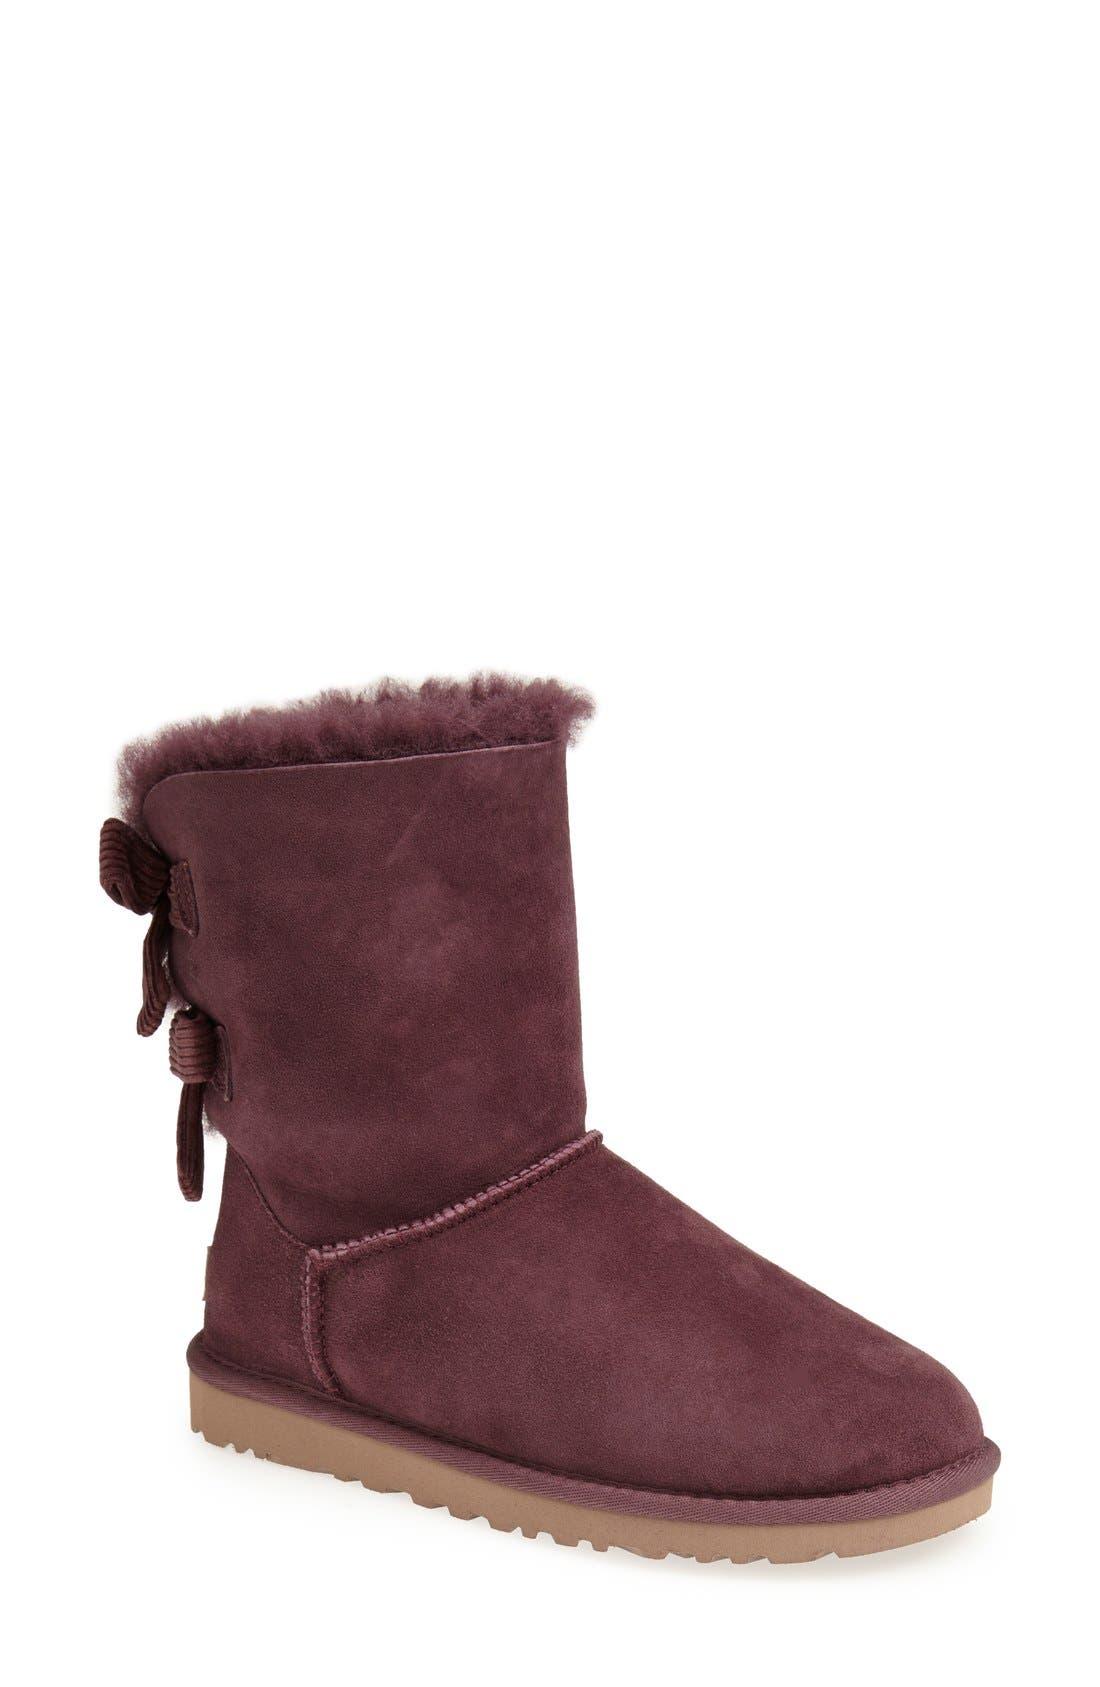 Alternate Image 1 Selected - UGG® Australia 'Bailey Bow Corduroy' Boot (Women)